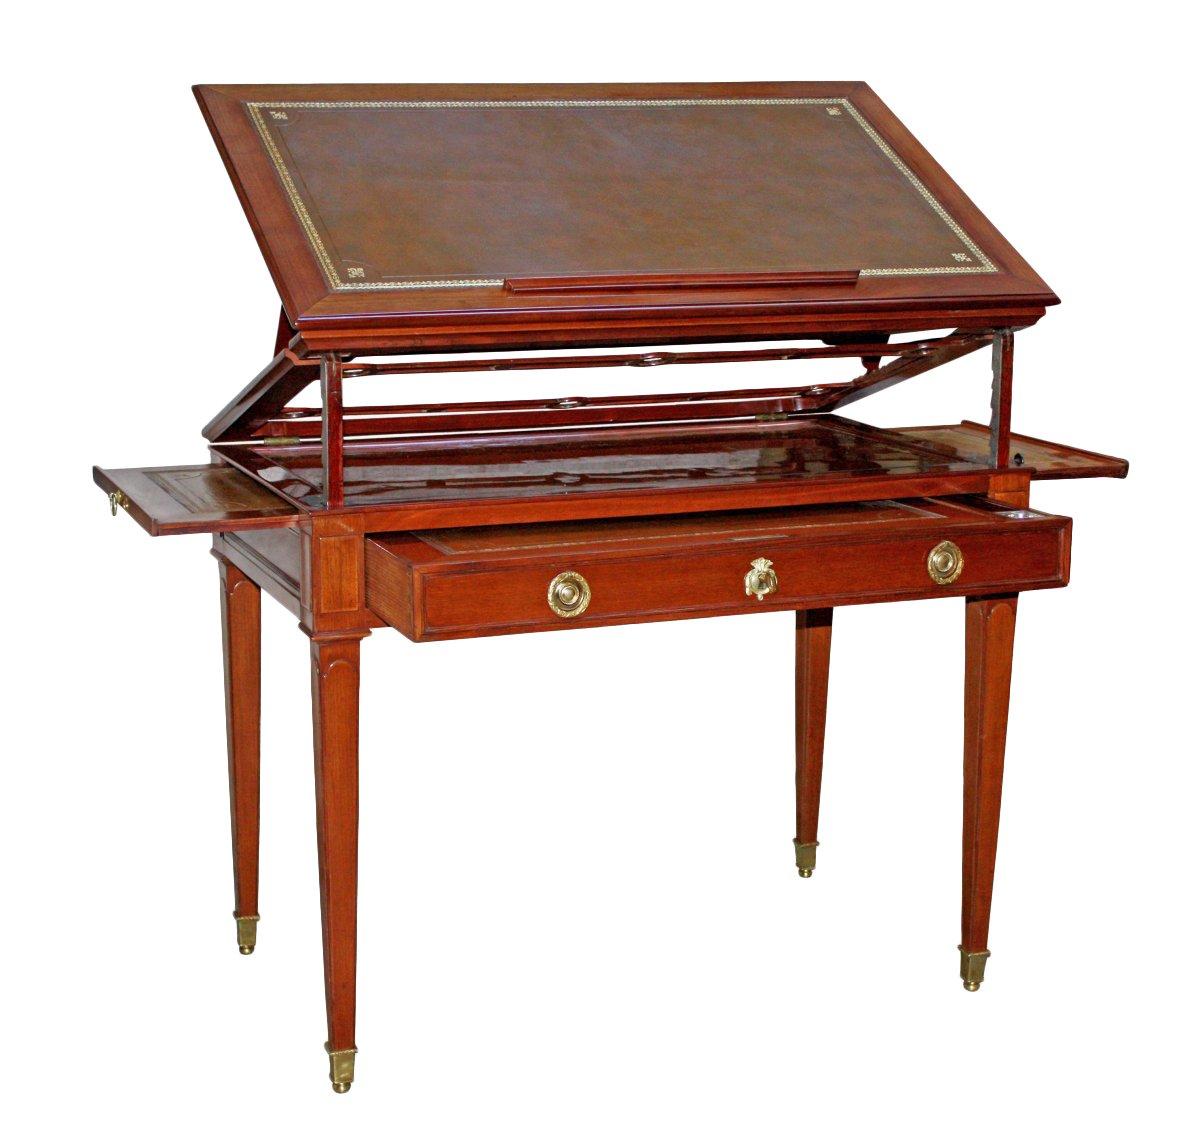 table d 39 architecte m canisme xviiie si cle. Black Bedroom Furniture Sets. Home Design Ideas